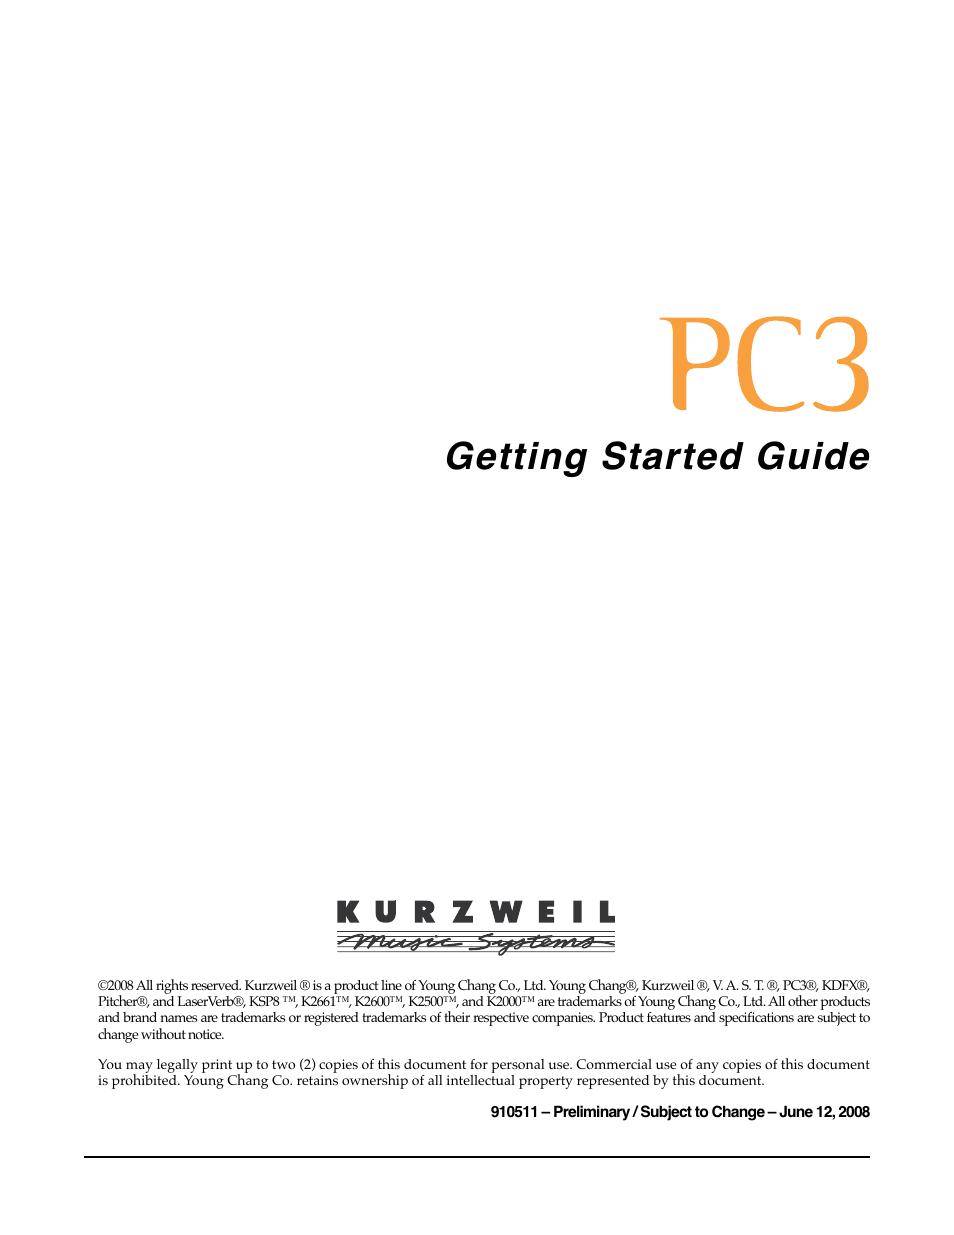 kurzweil ksp8 tm user manual 122 pages rh manualsdir com Brand Strategy Process Guideline Template